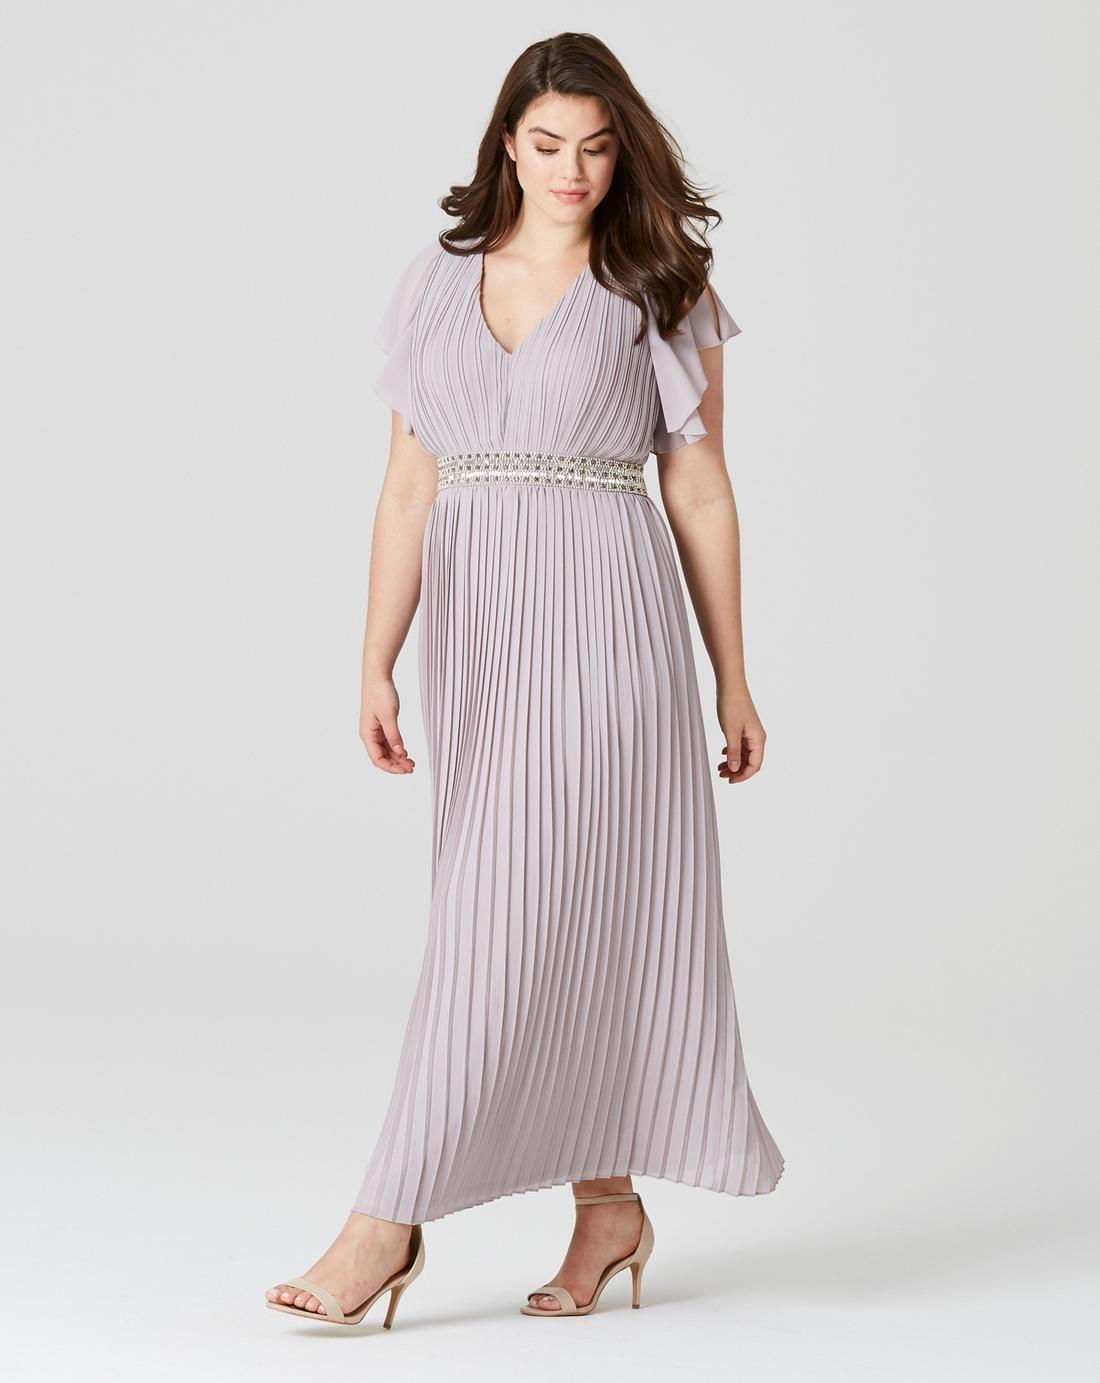 Tfnc Sienna Maxi Dress Plus Size Wedding Guest Dresses Beautiful Long Dresses Plus Size Long Dresses